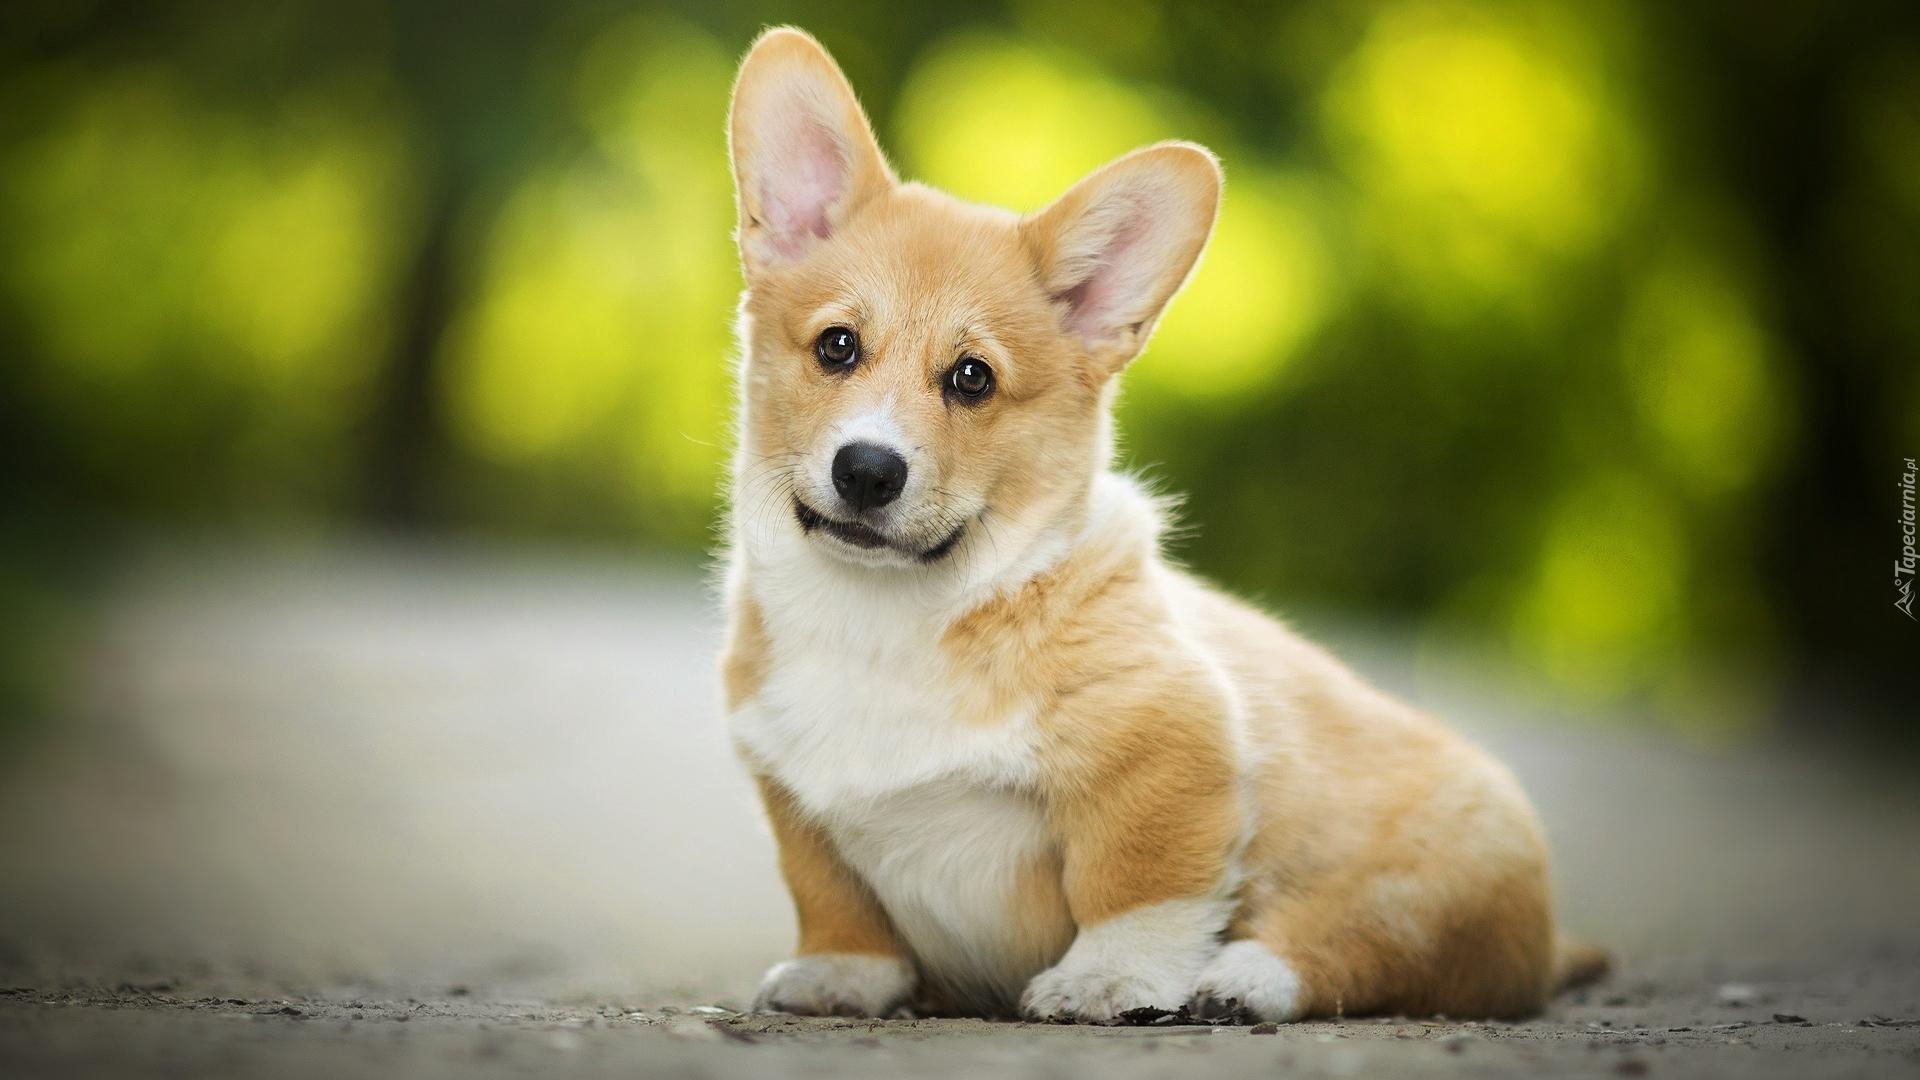 A Cute Puppy Wallpaper Siedzący Szczeniak Welsh Corgi Pembroke